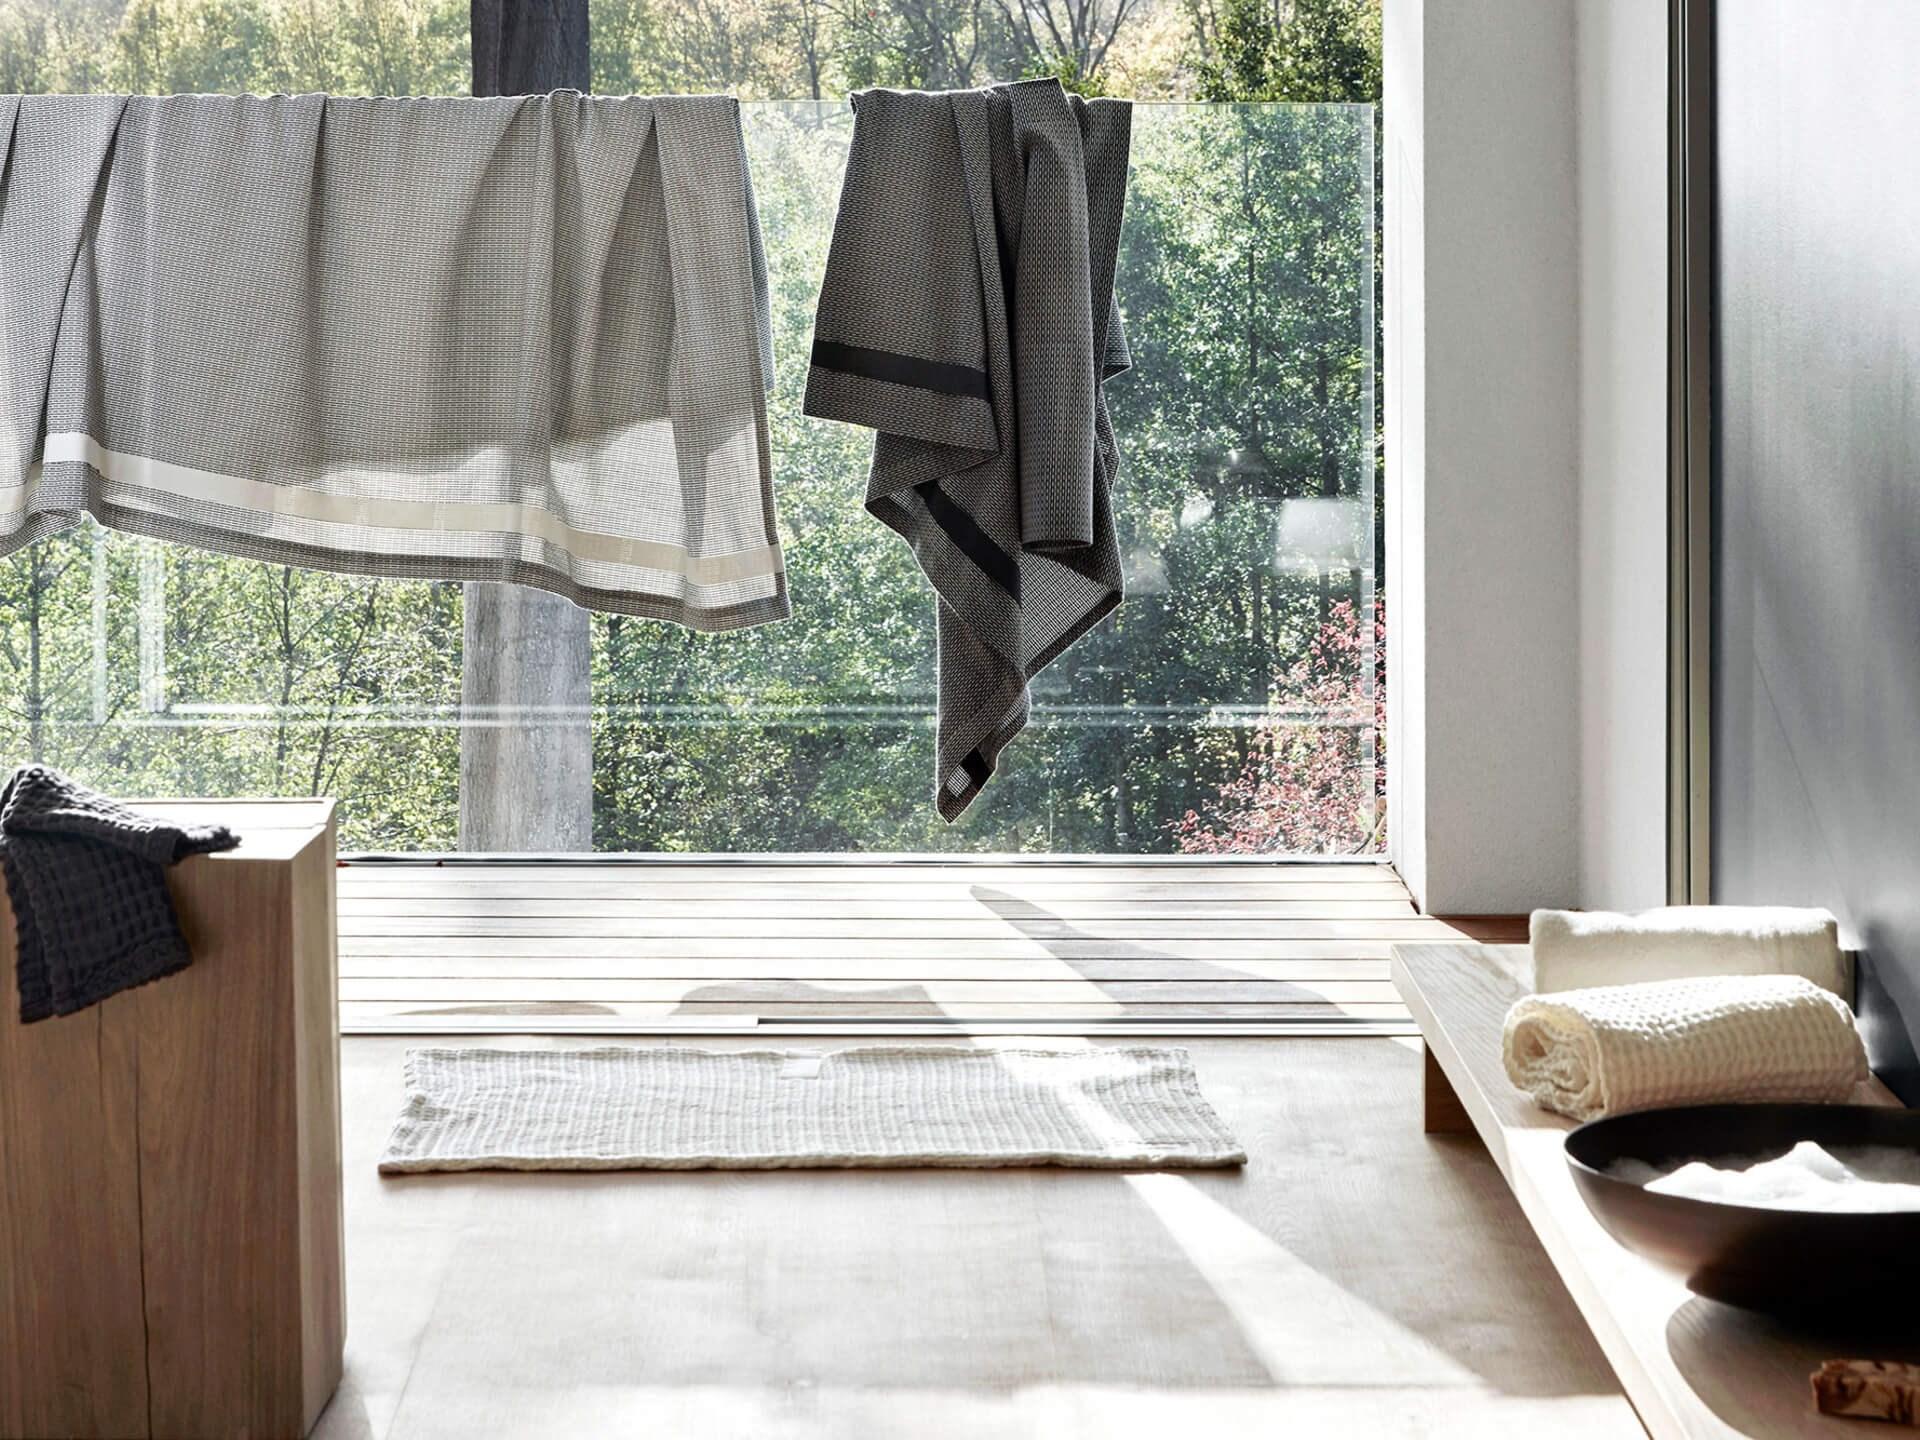 Miljøbilde badehåndkle i bomull. Wellness towel fra The Organic Company i morgning grey. Hengt på snor i japaninspirert bad.